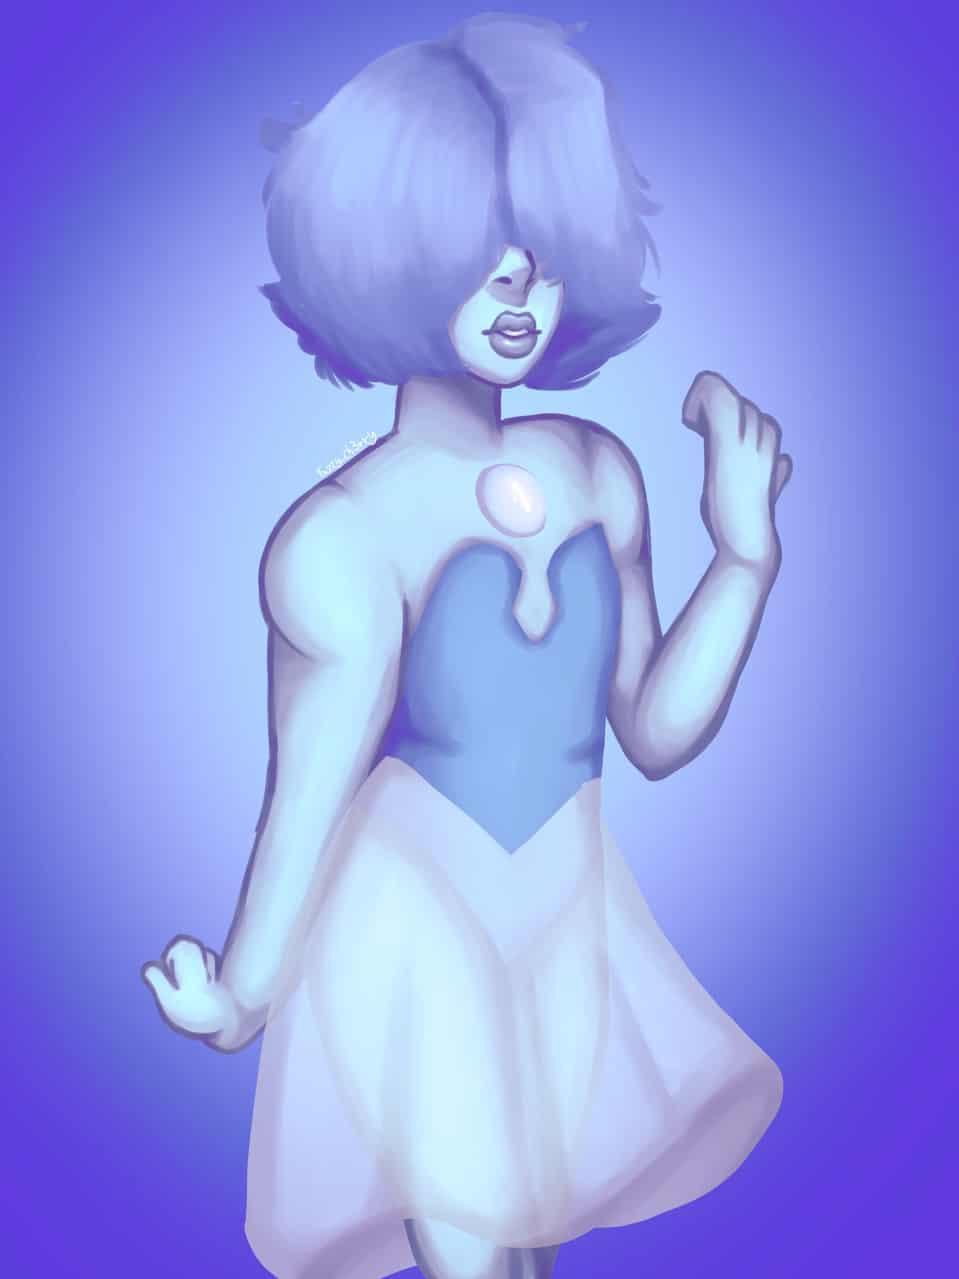 Blue pearl Illust of ♣︎Ch3rry_Pi3♣︎|Edd medibangpaint blue Fuzzy_ch3rry lips StevenUniverse cute asthetic Pearl